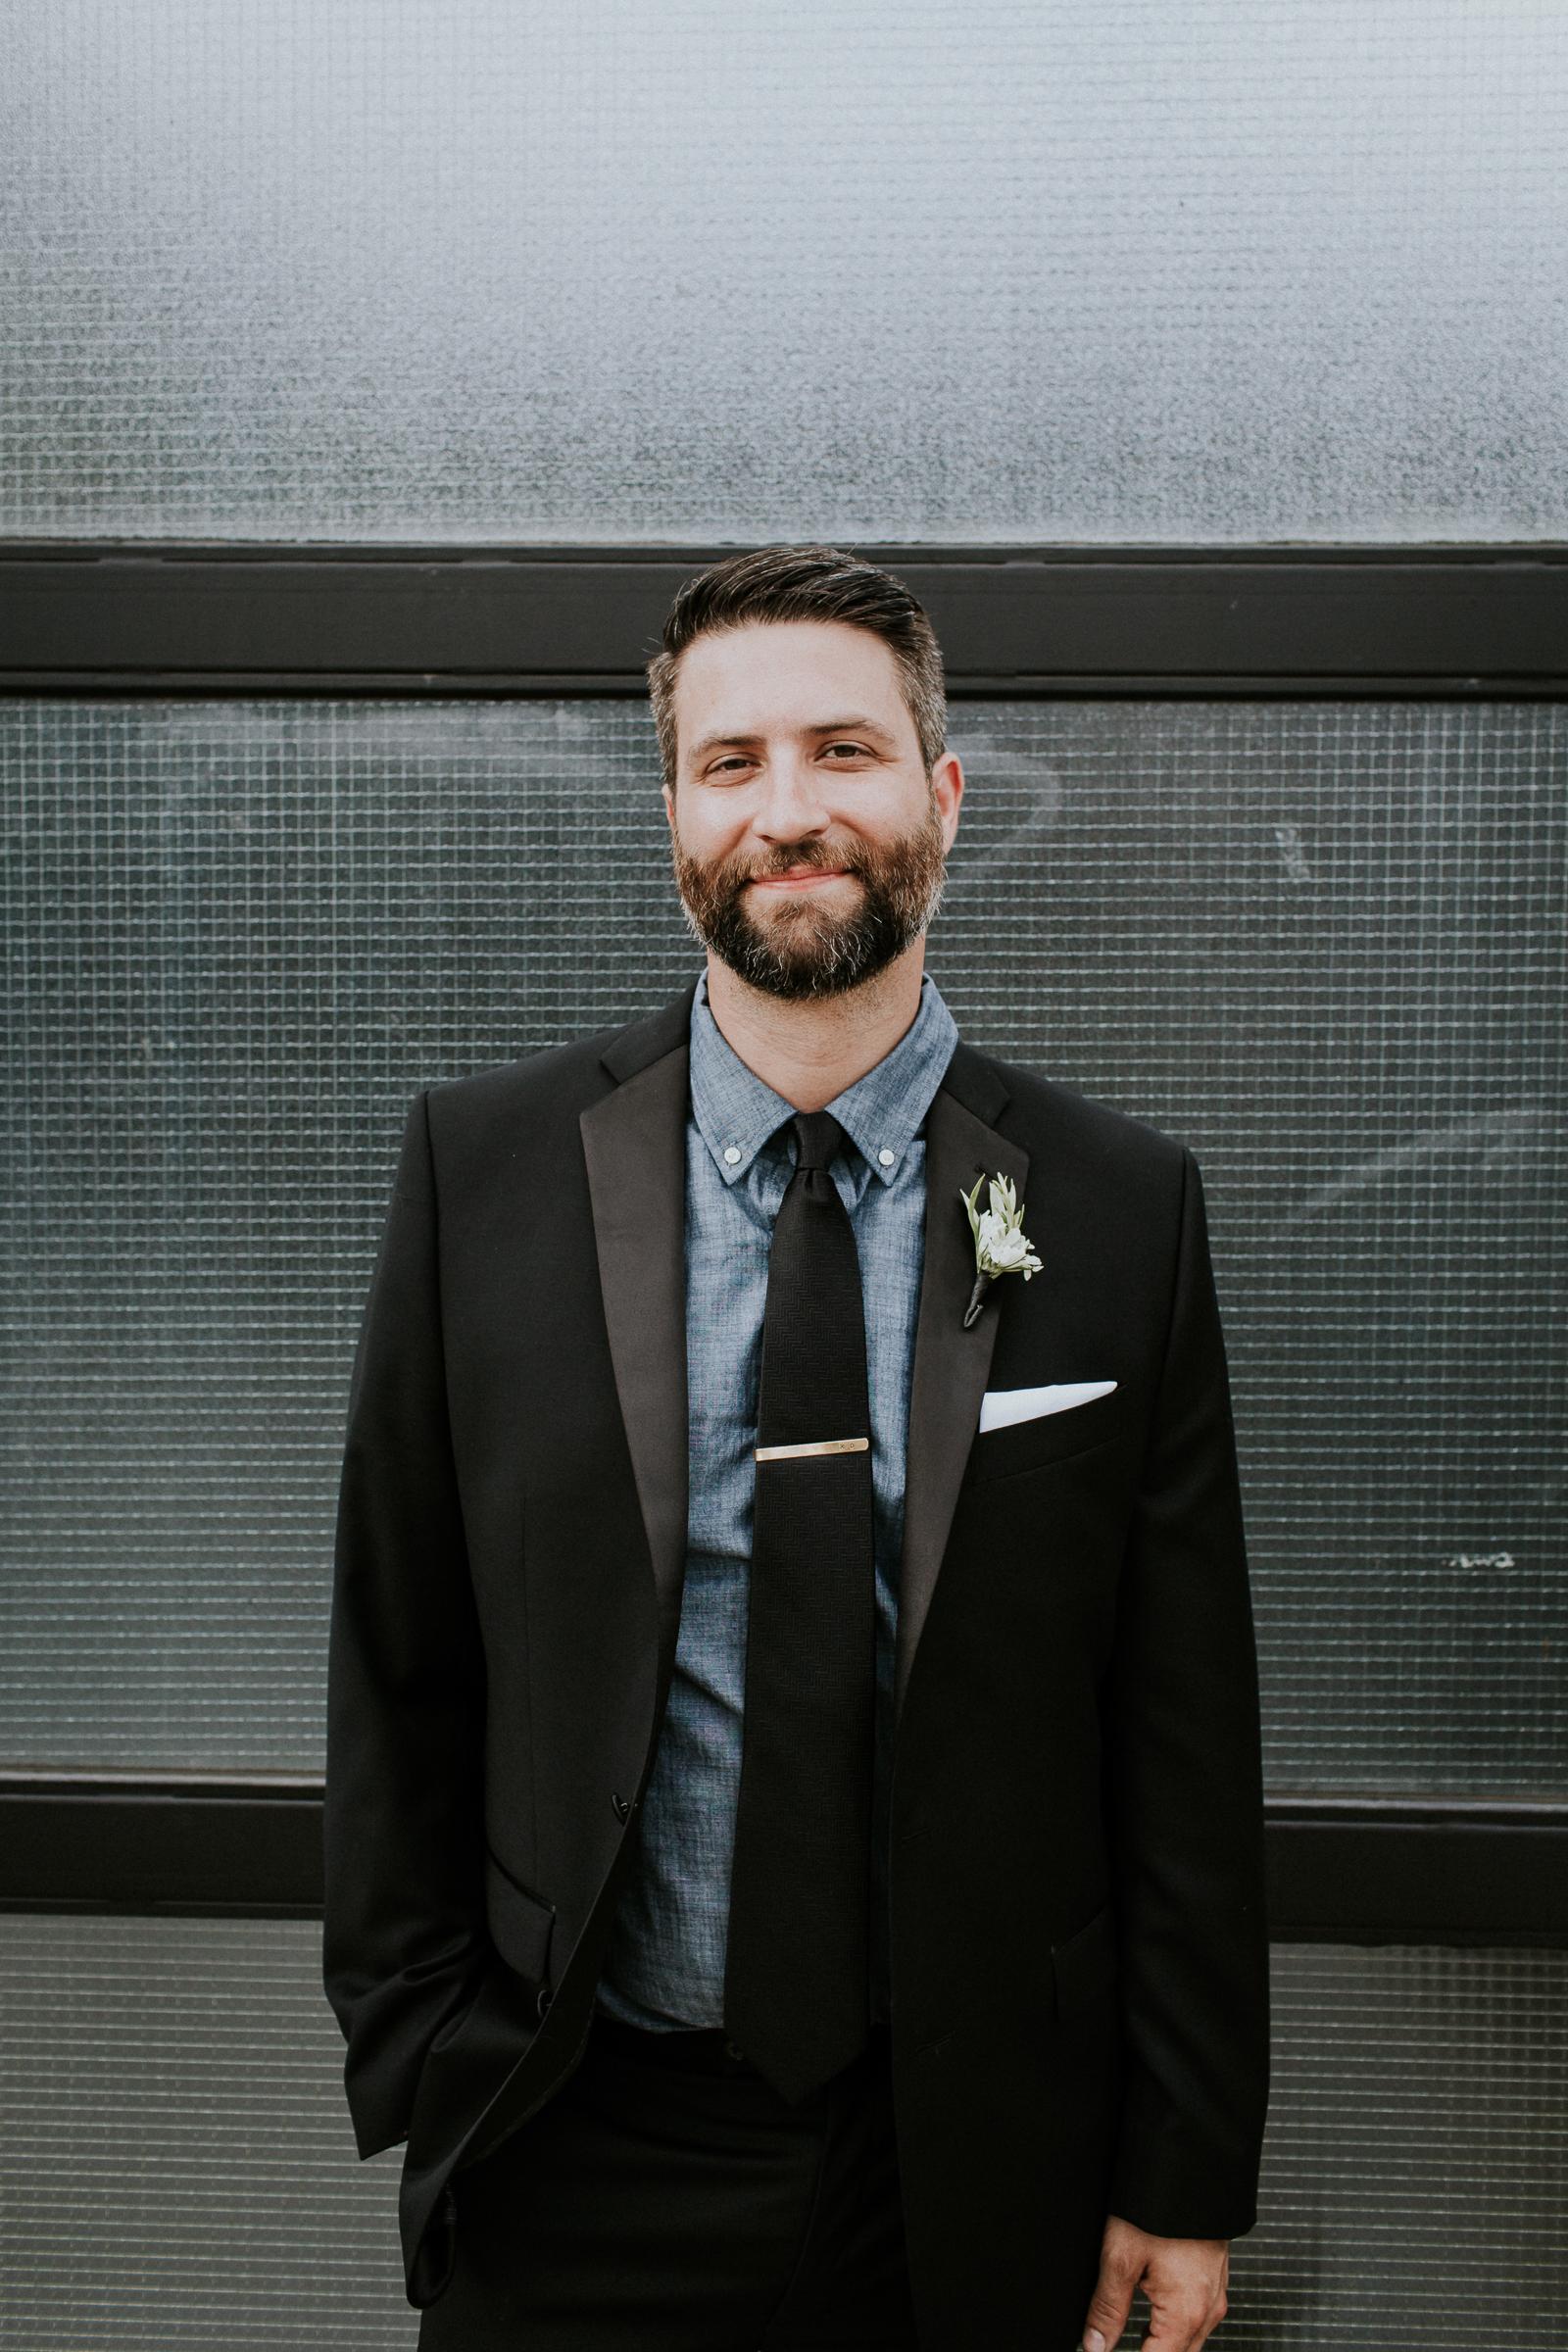 501-Union-Brooklyn-Fine-Art-Documentary-Wedding-Photographer-51.jpg